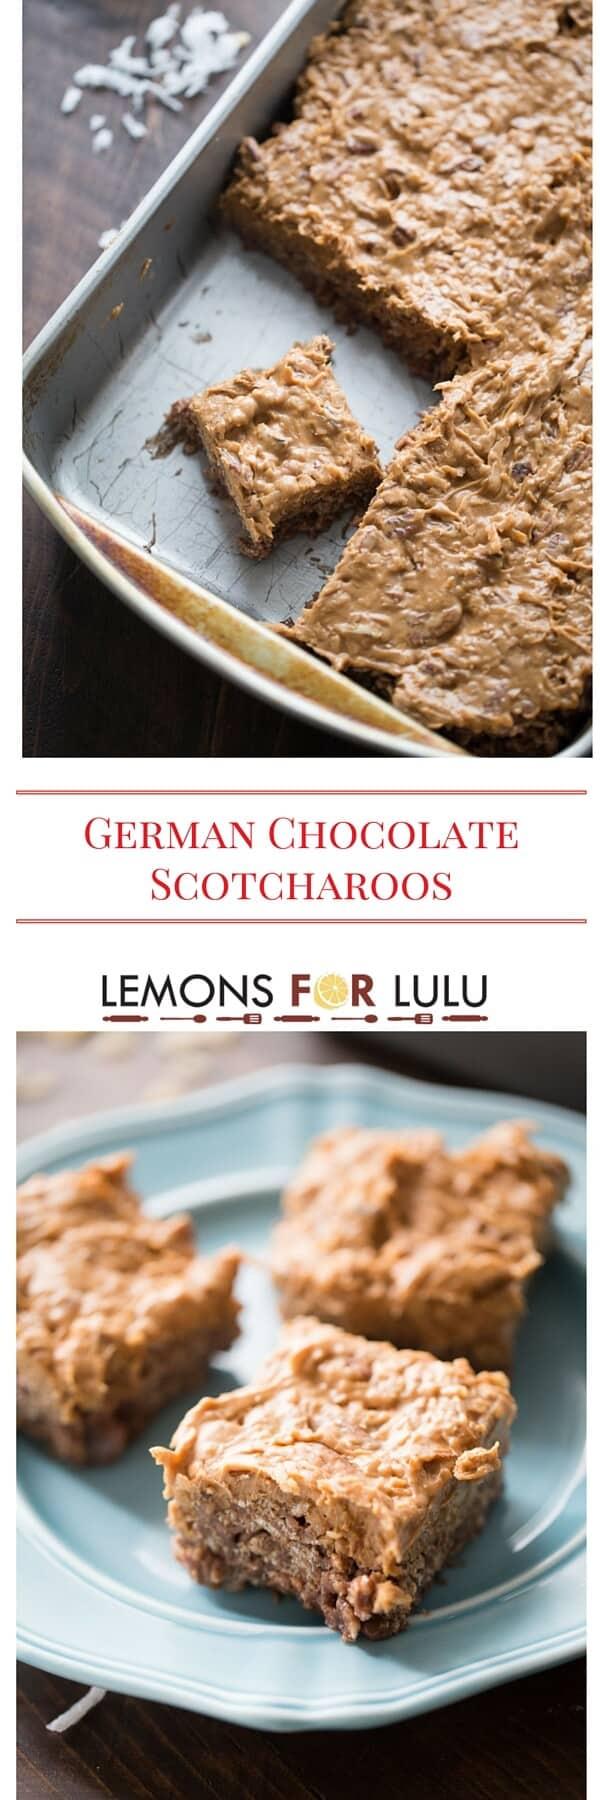 Everyone loves scotcharoos! These German chocolate schotcharoos are irresistible!